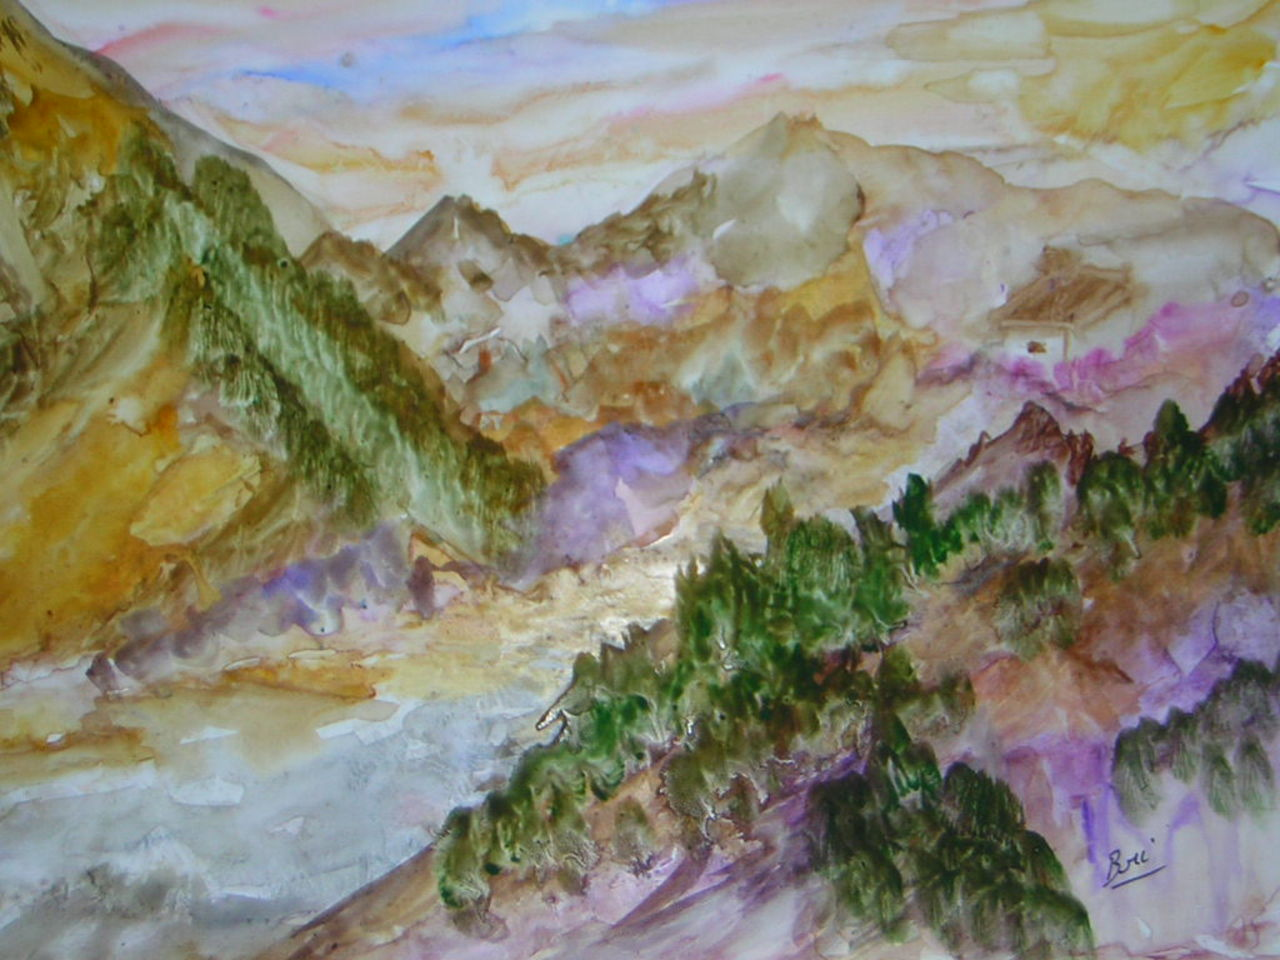 Brigitte Noelle montagne